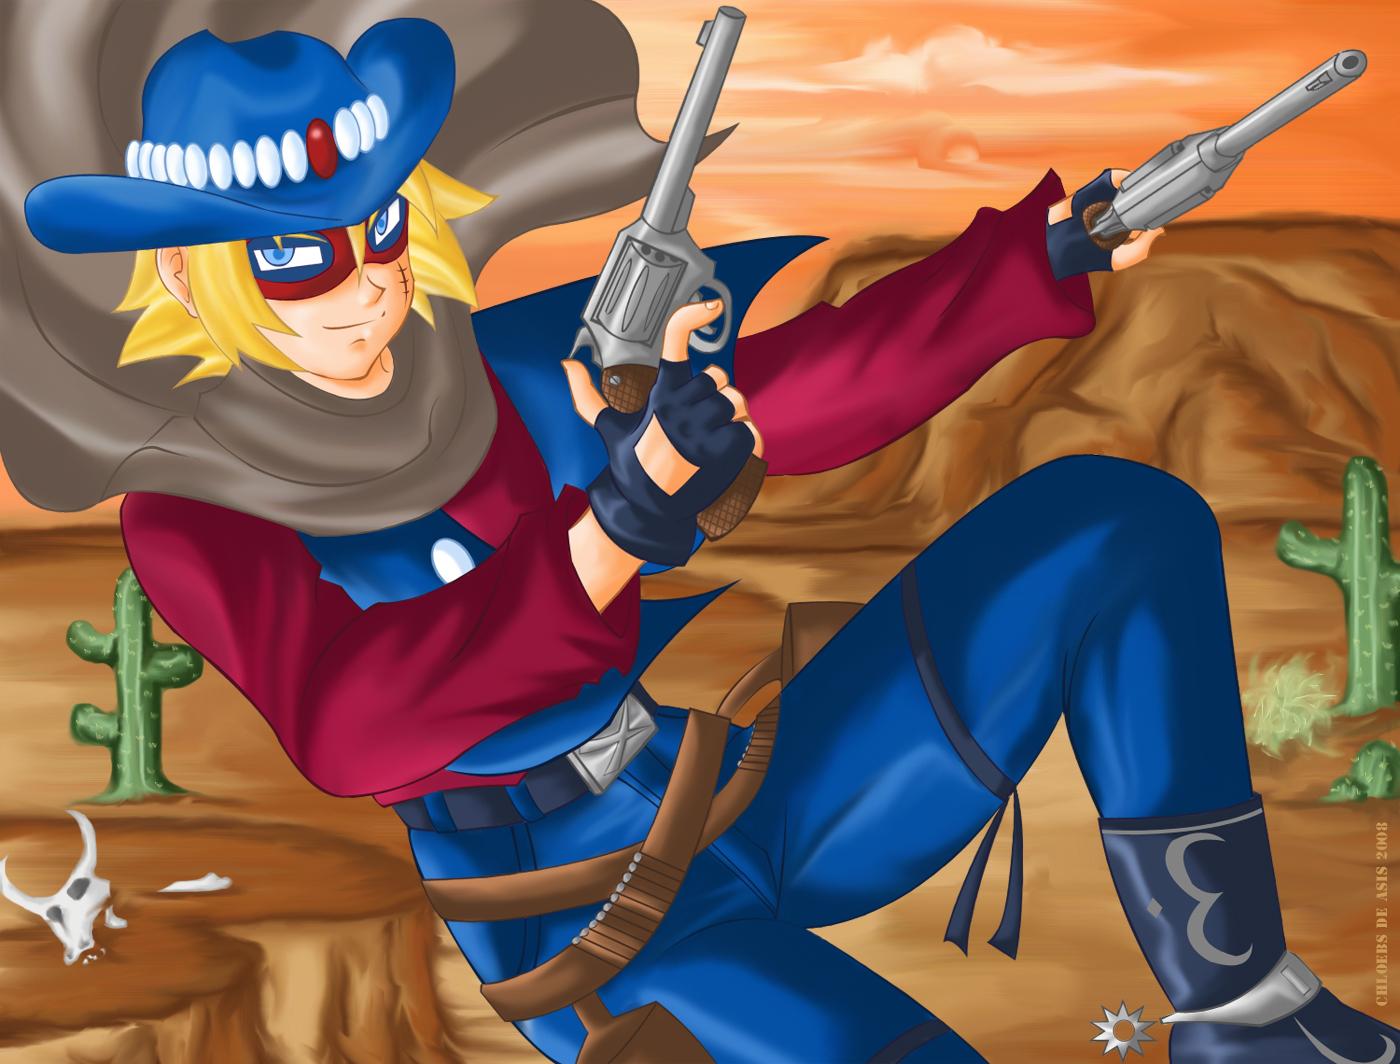 The Lone Gunman by chloebs